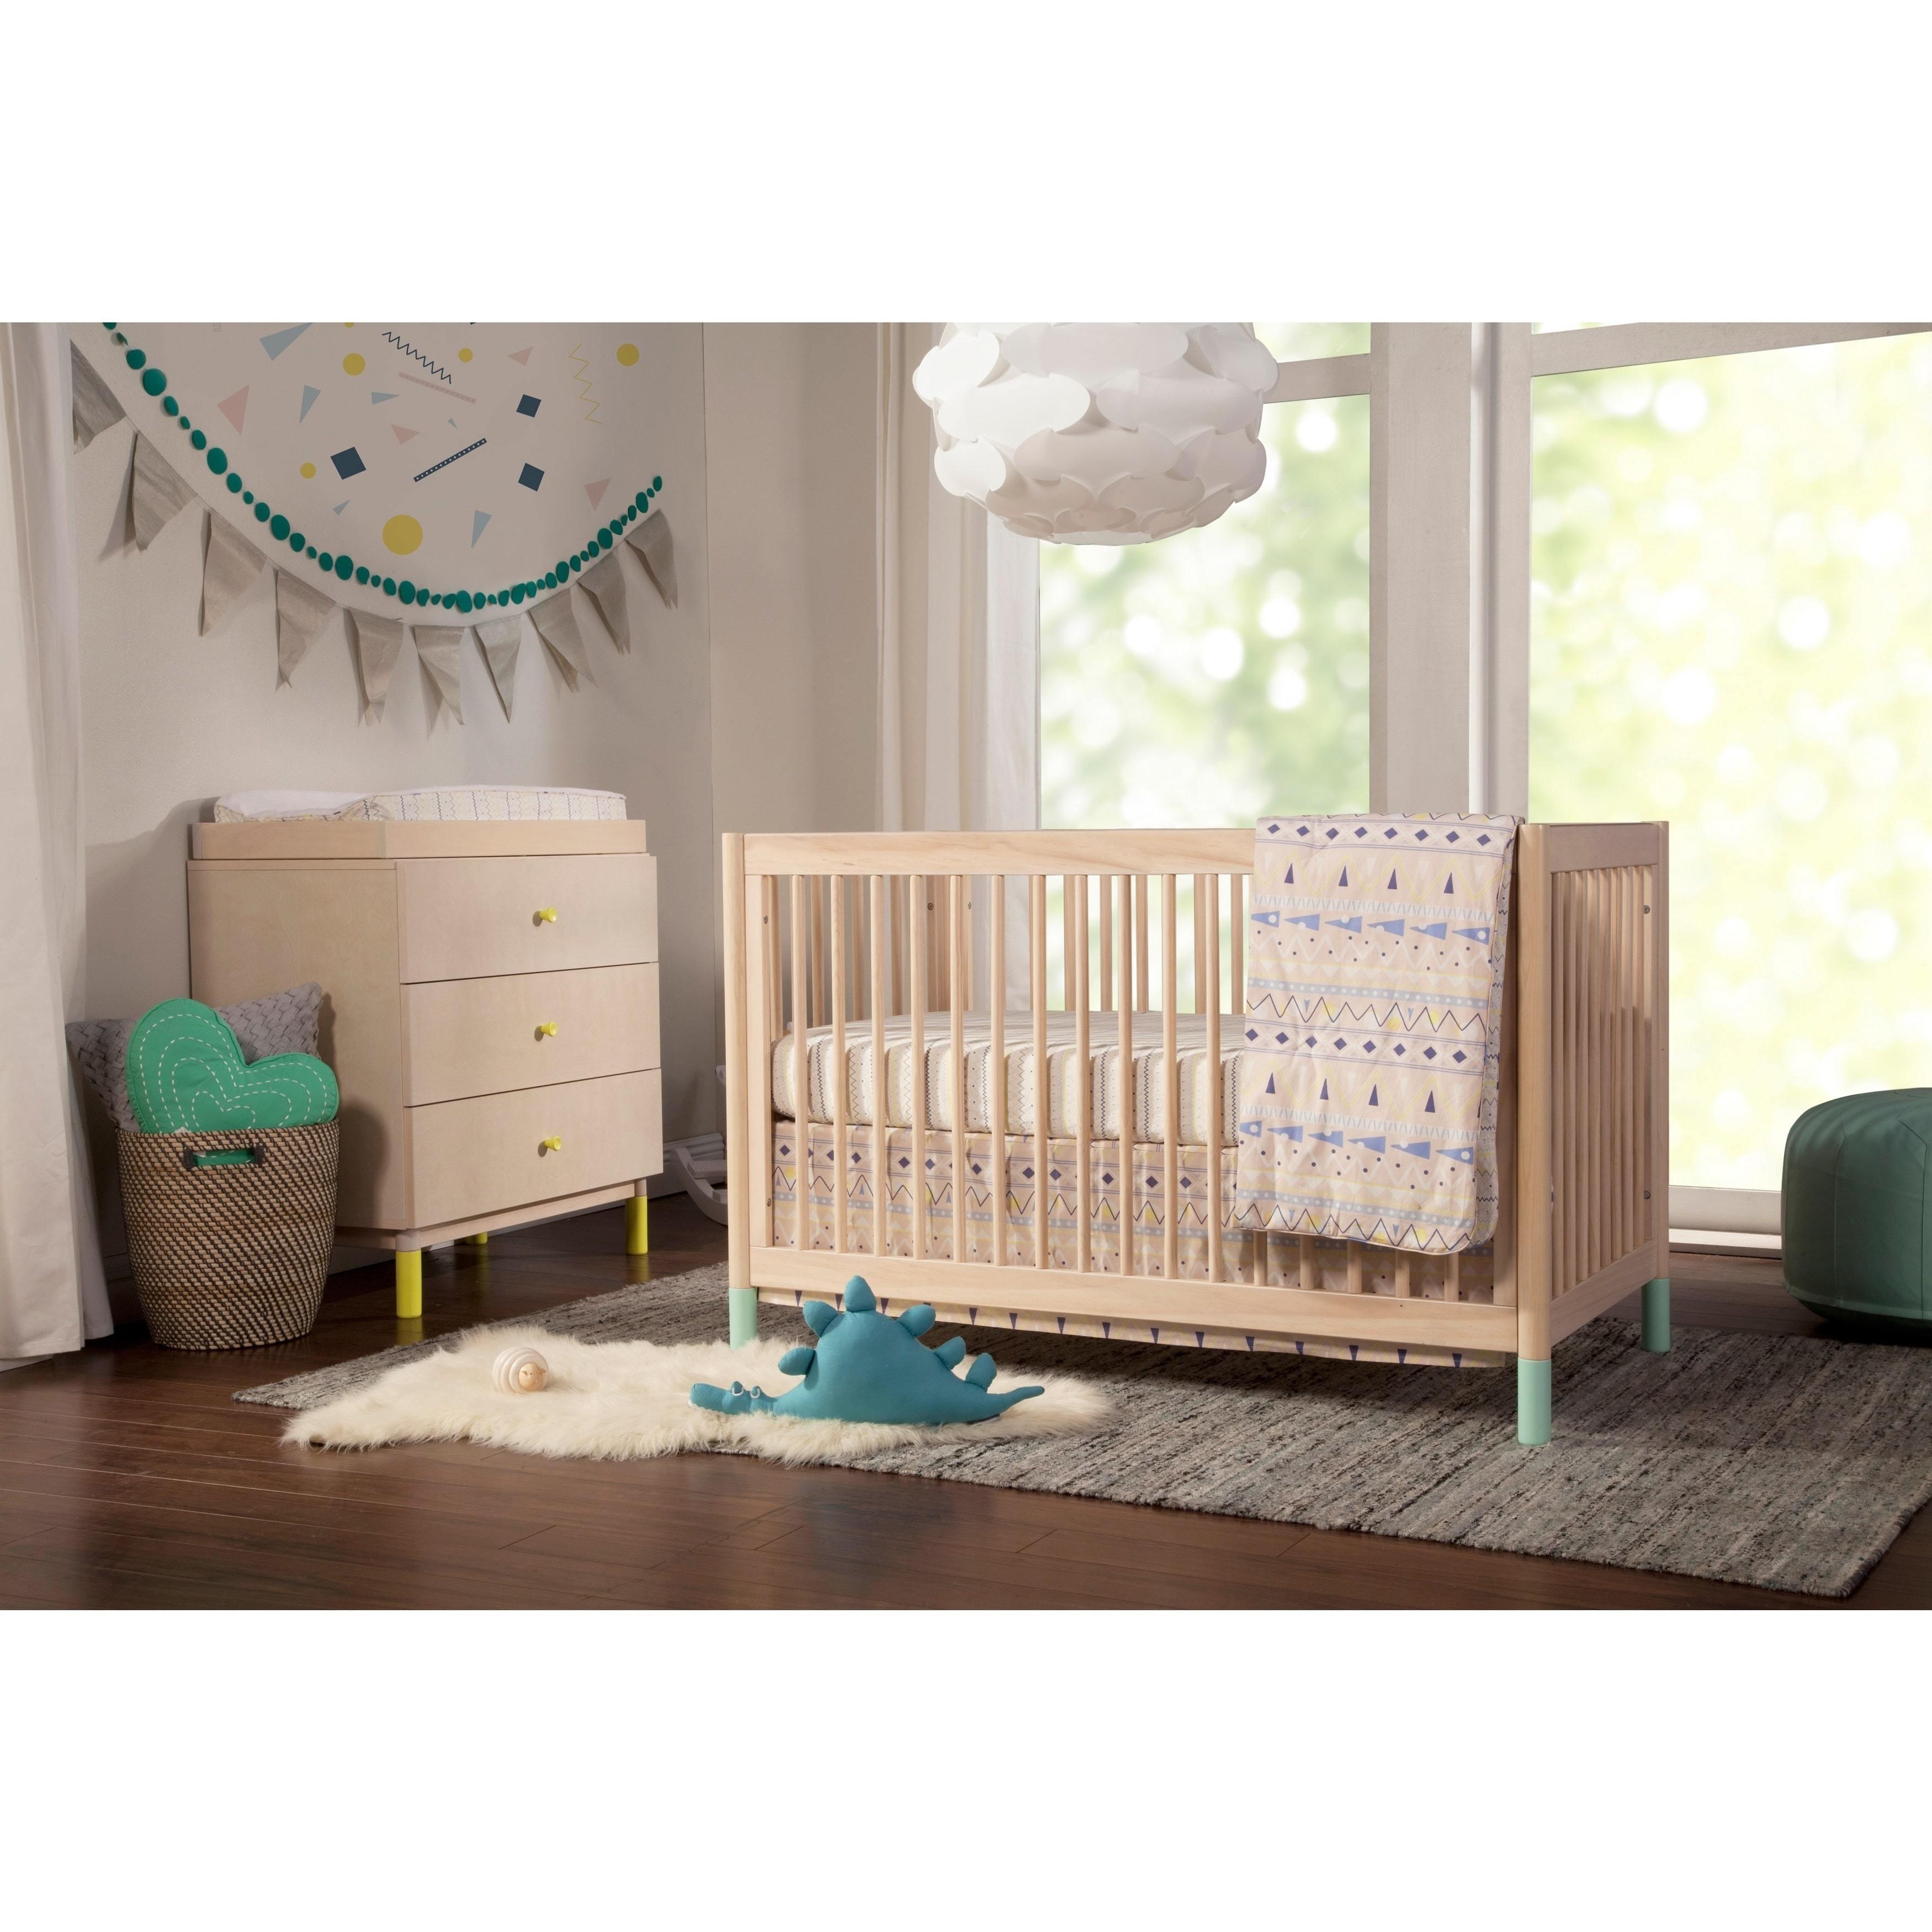 Desert Dreams Nursery Bedding